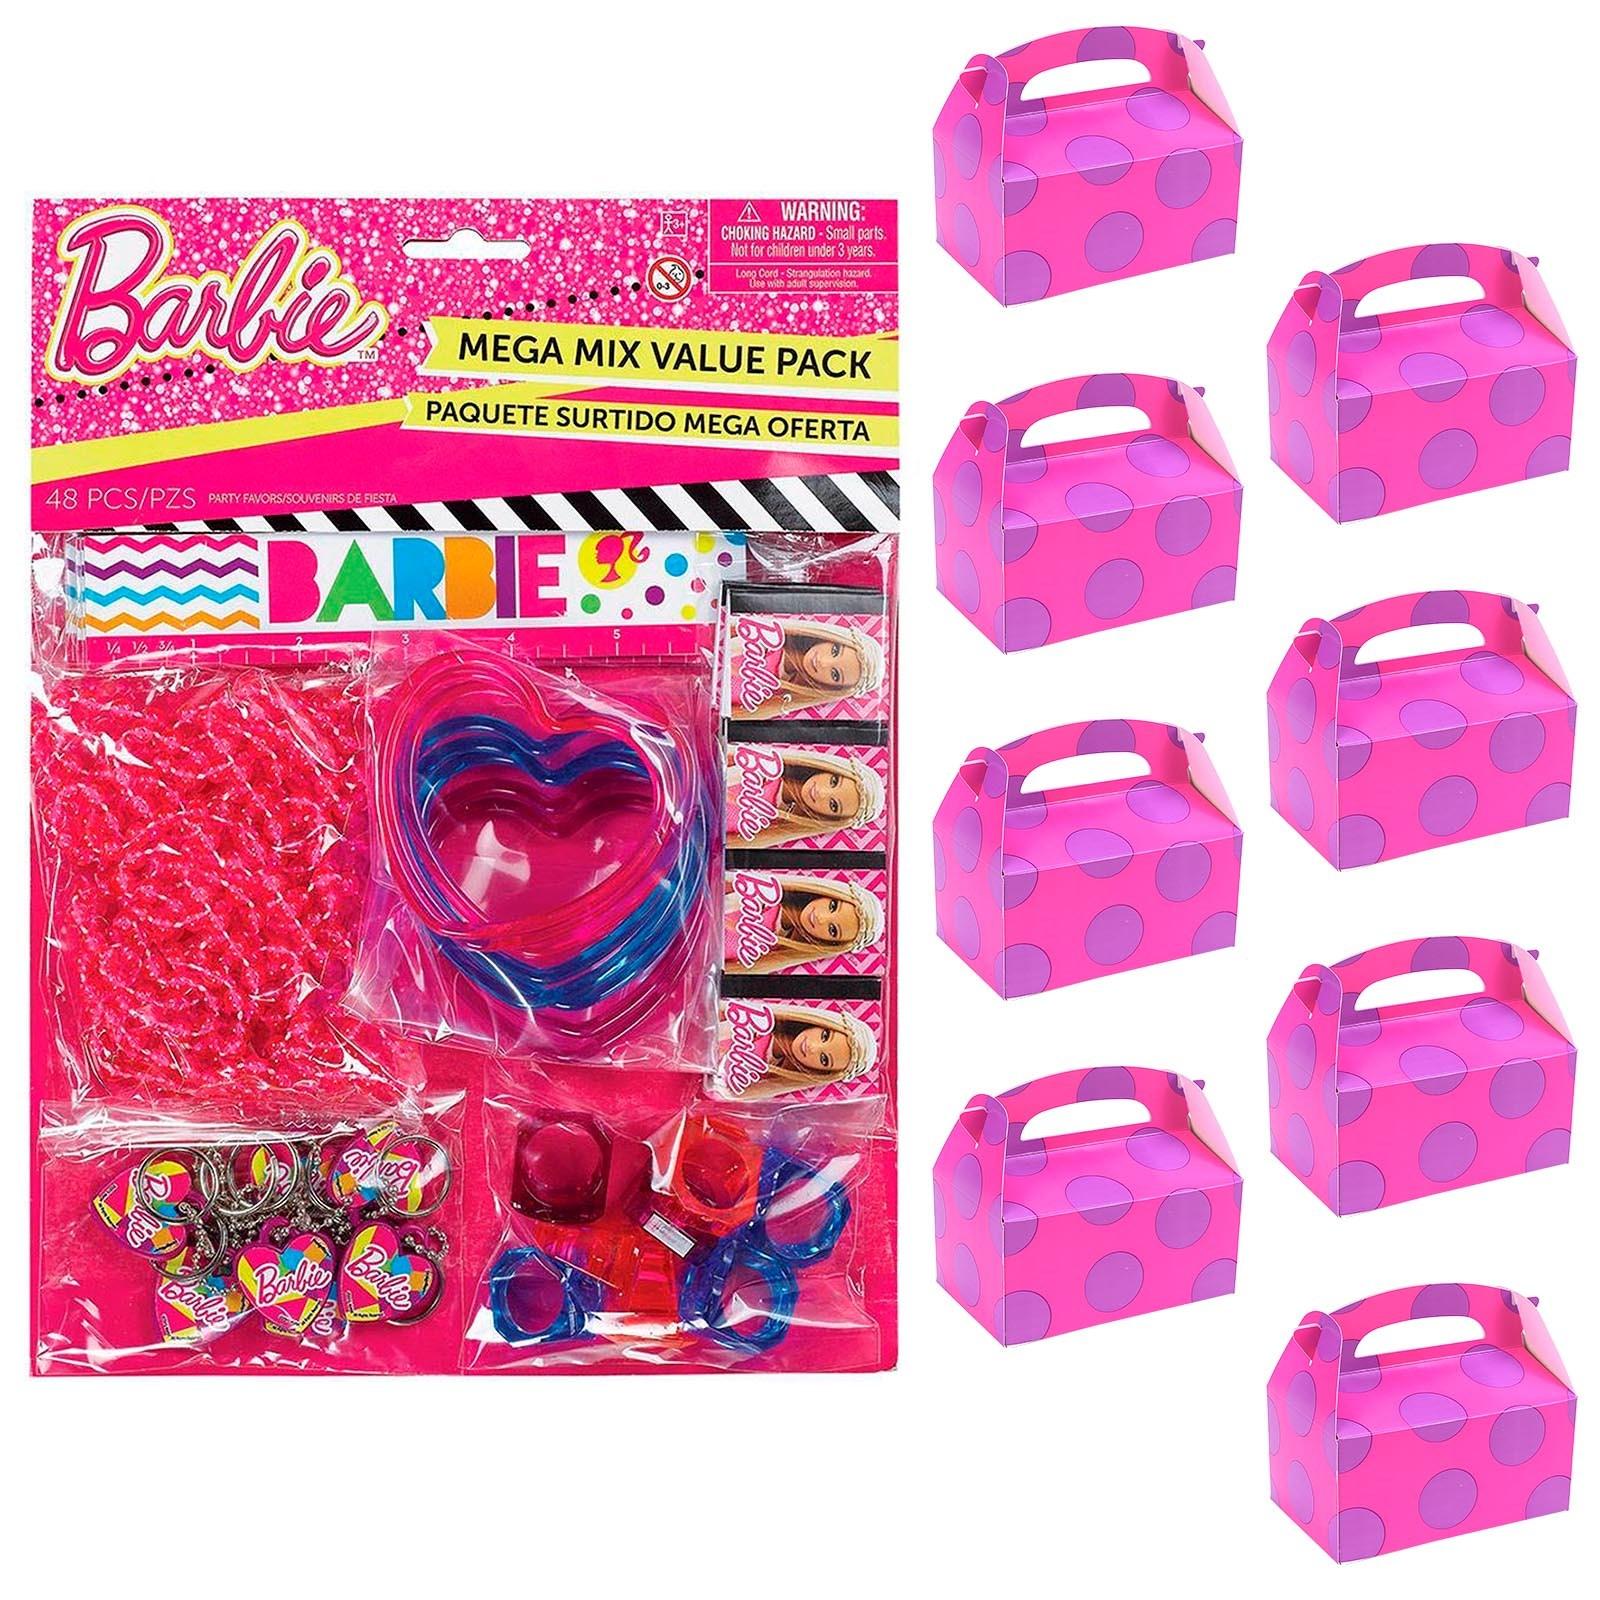 Barbie Filled Favor Box Kit (For 8 Guests)